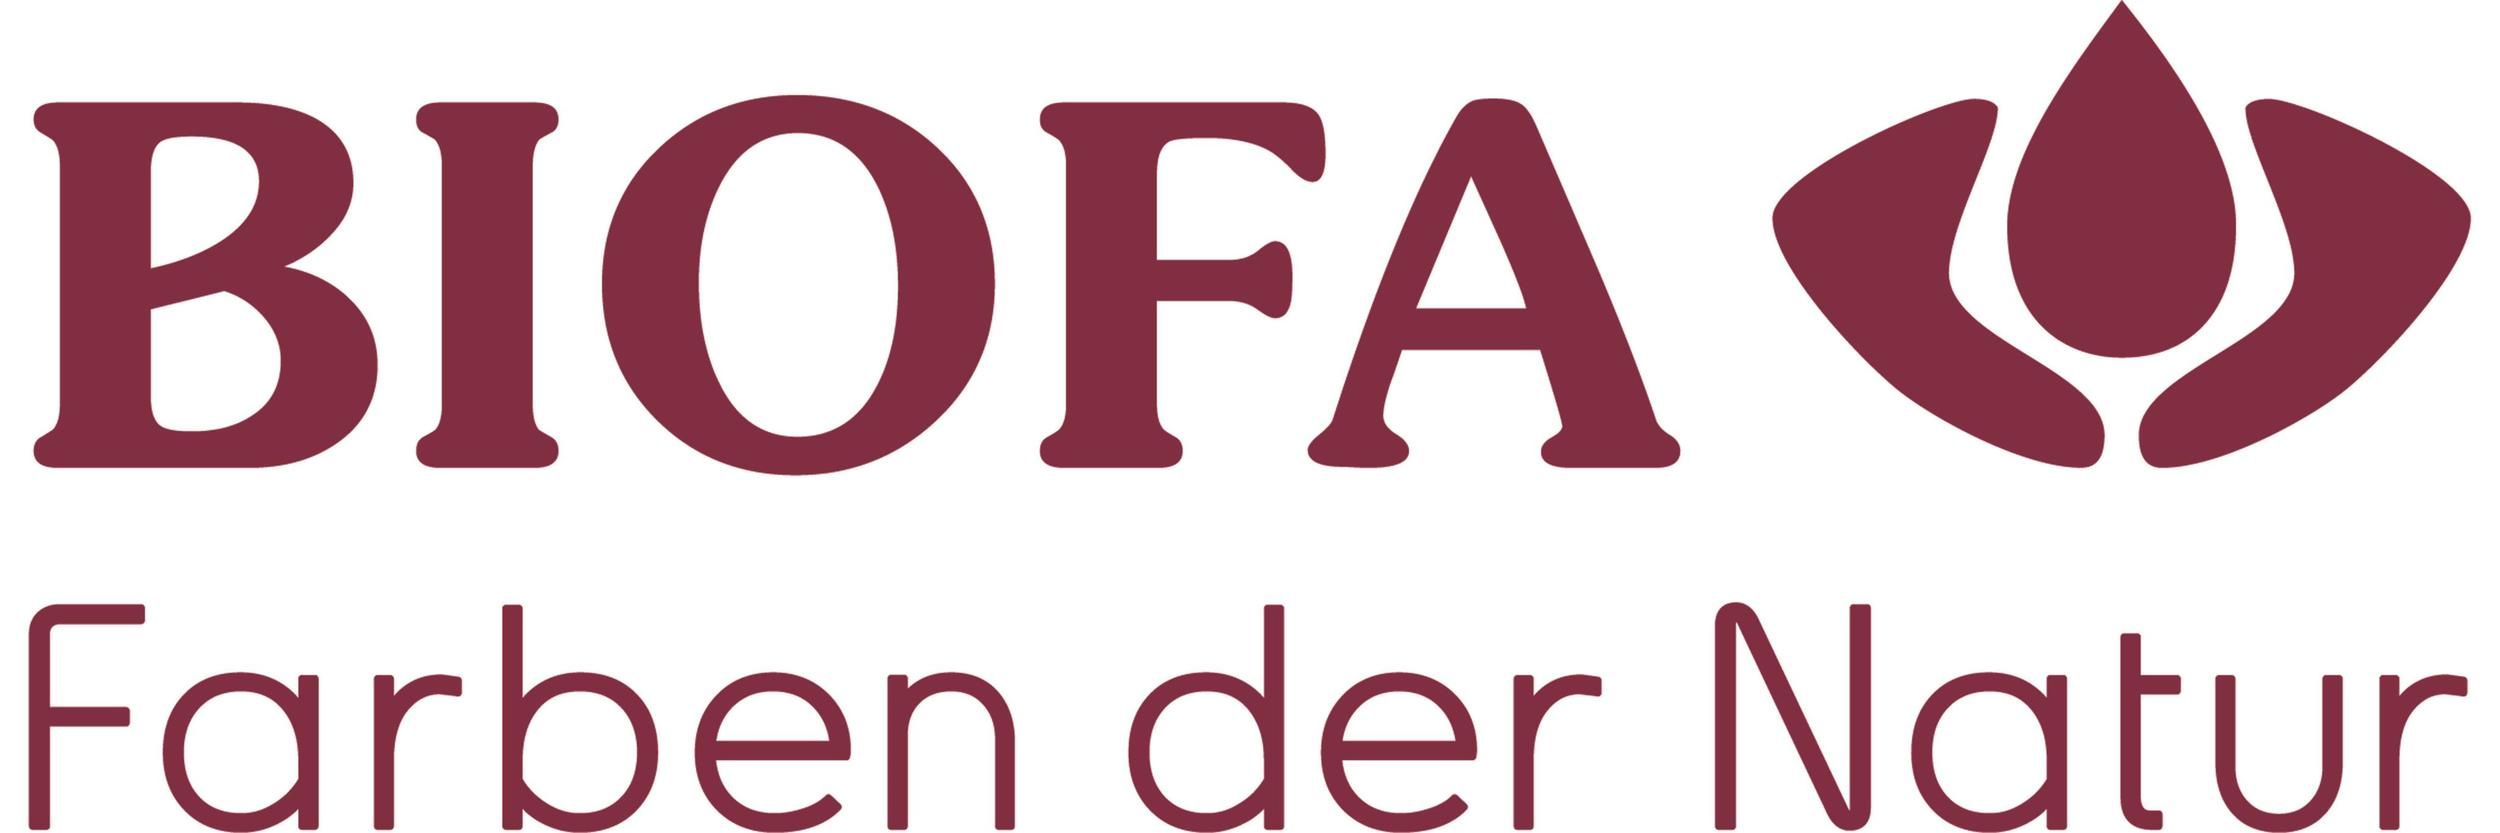 Biofa logo.jpg